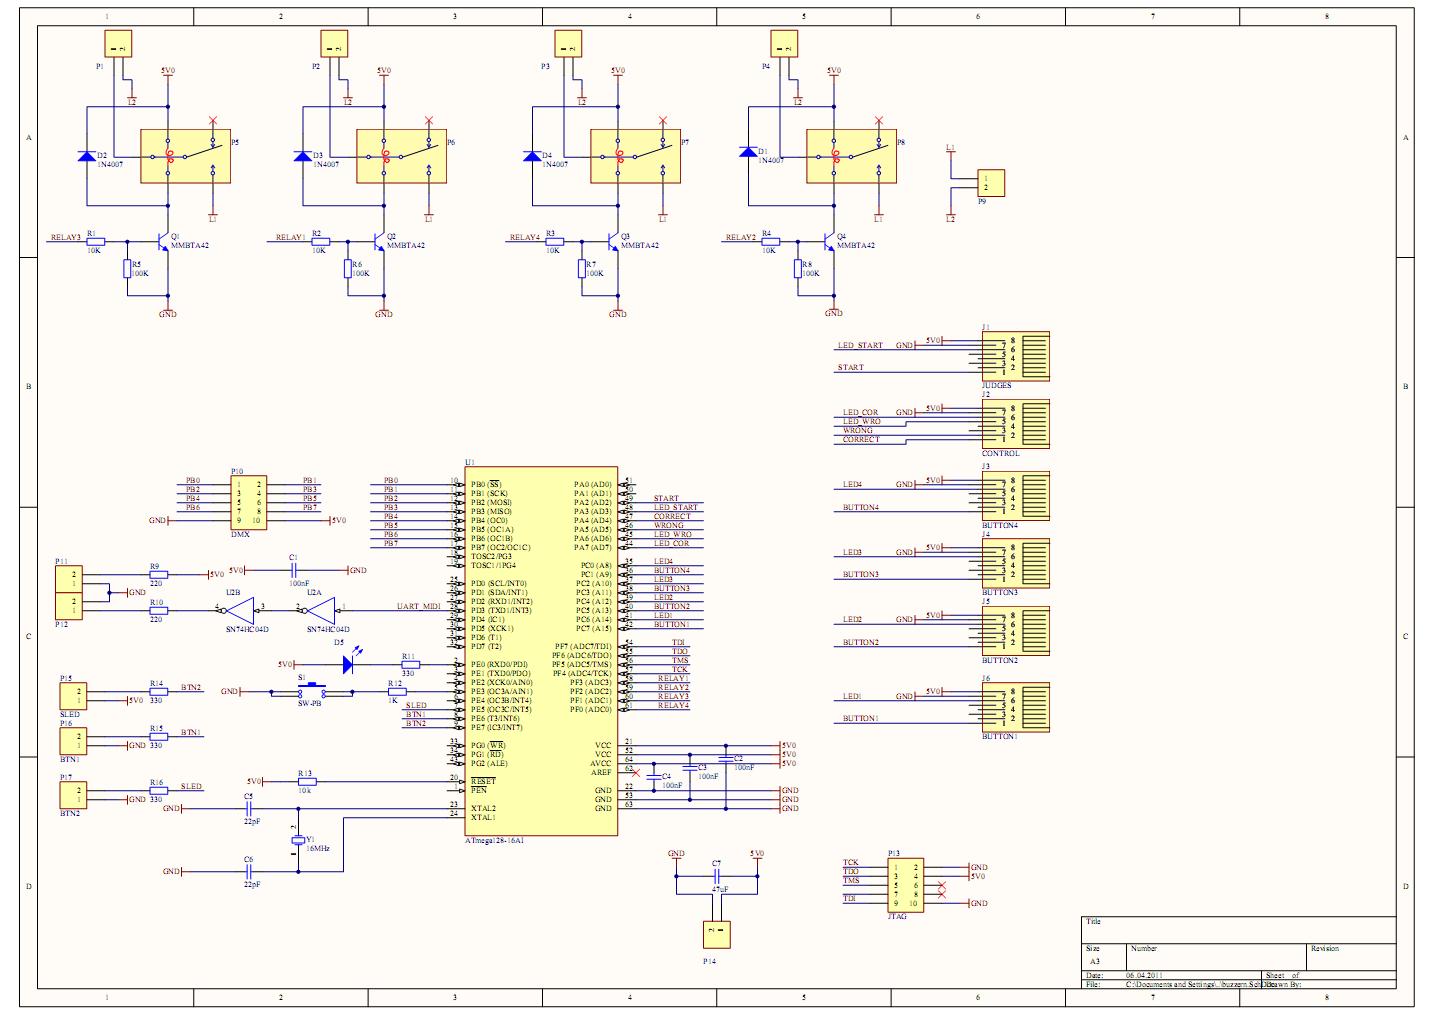 Gt245 Wiring Diagram Automotive John Deere Gt275 Parts Mower